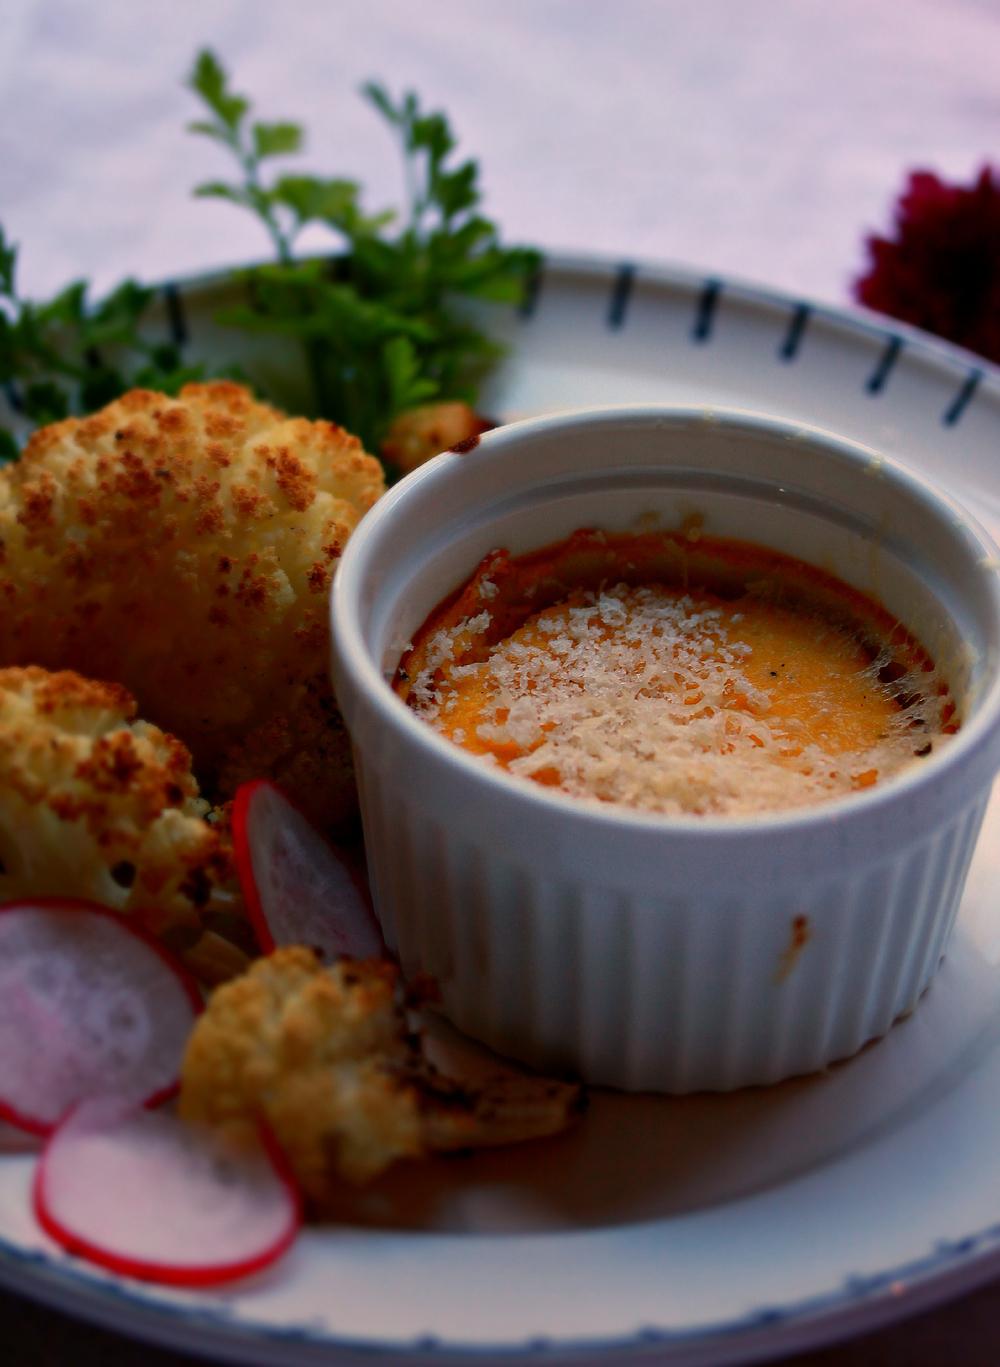 ©Squash Gratin with Cauliflower by Dena T Bray